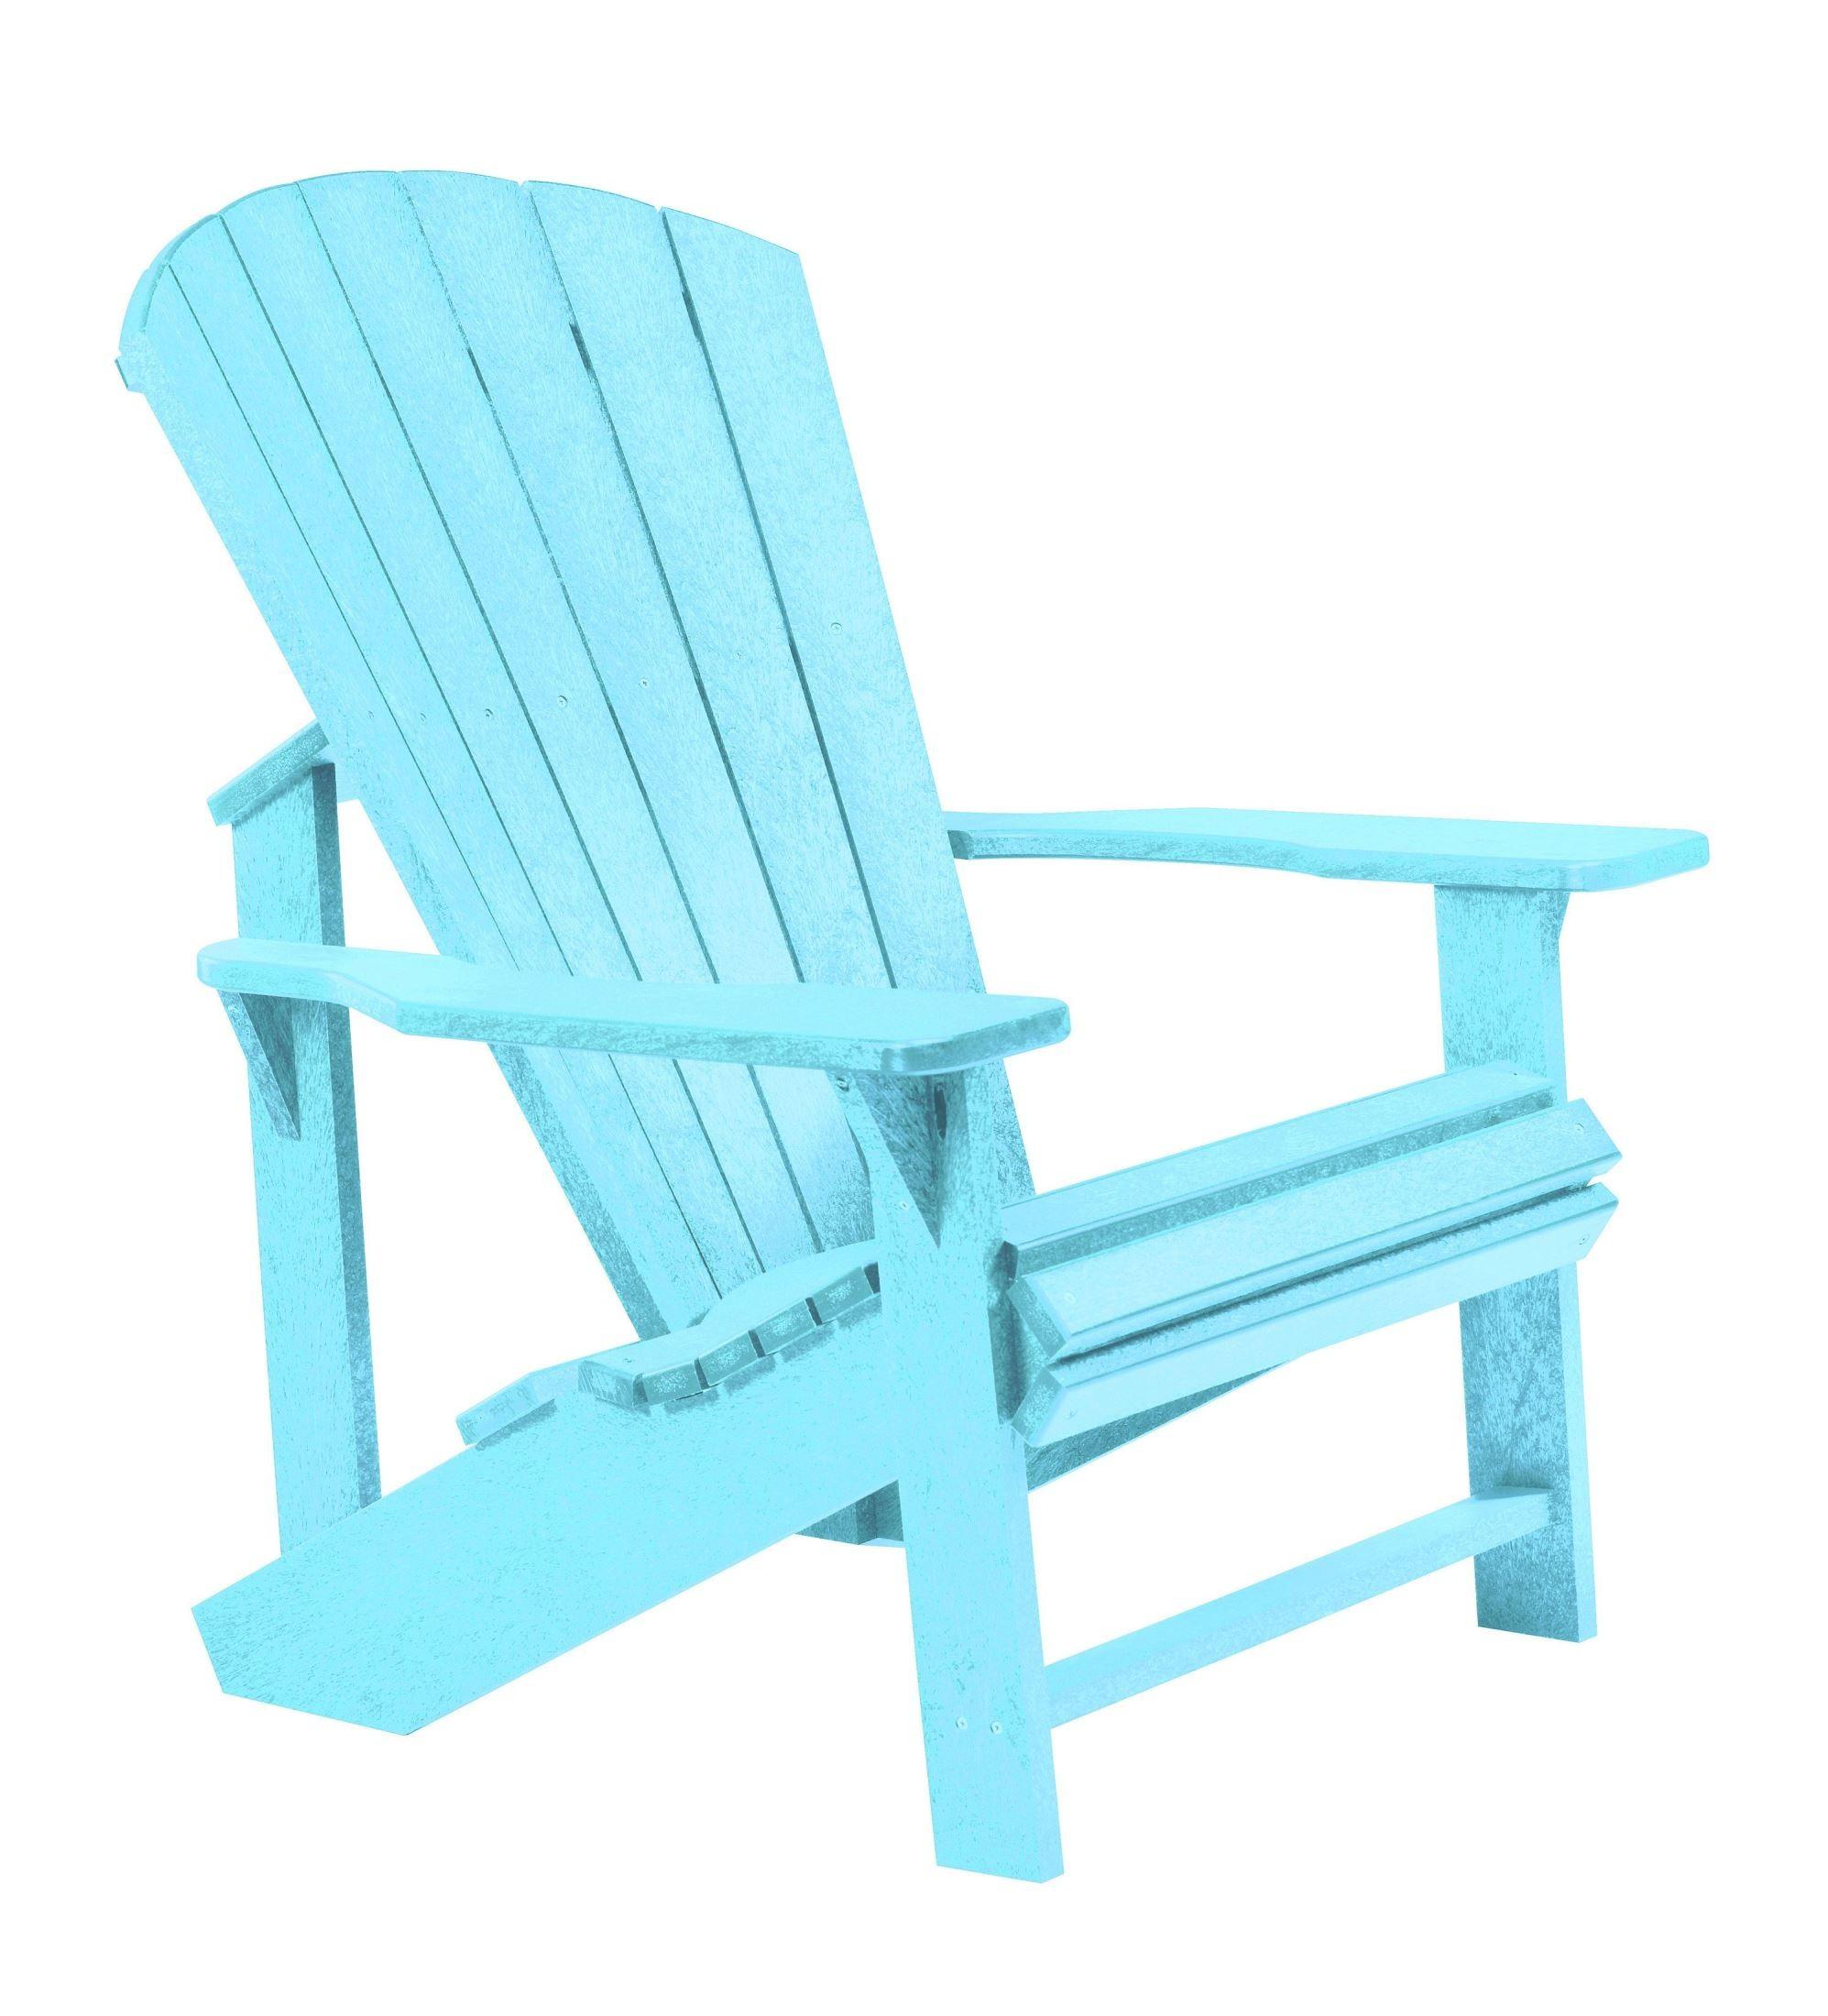 aqua adirondack chairs bar height patio generations chair from cr plastic c01 11